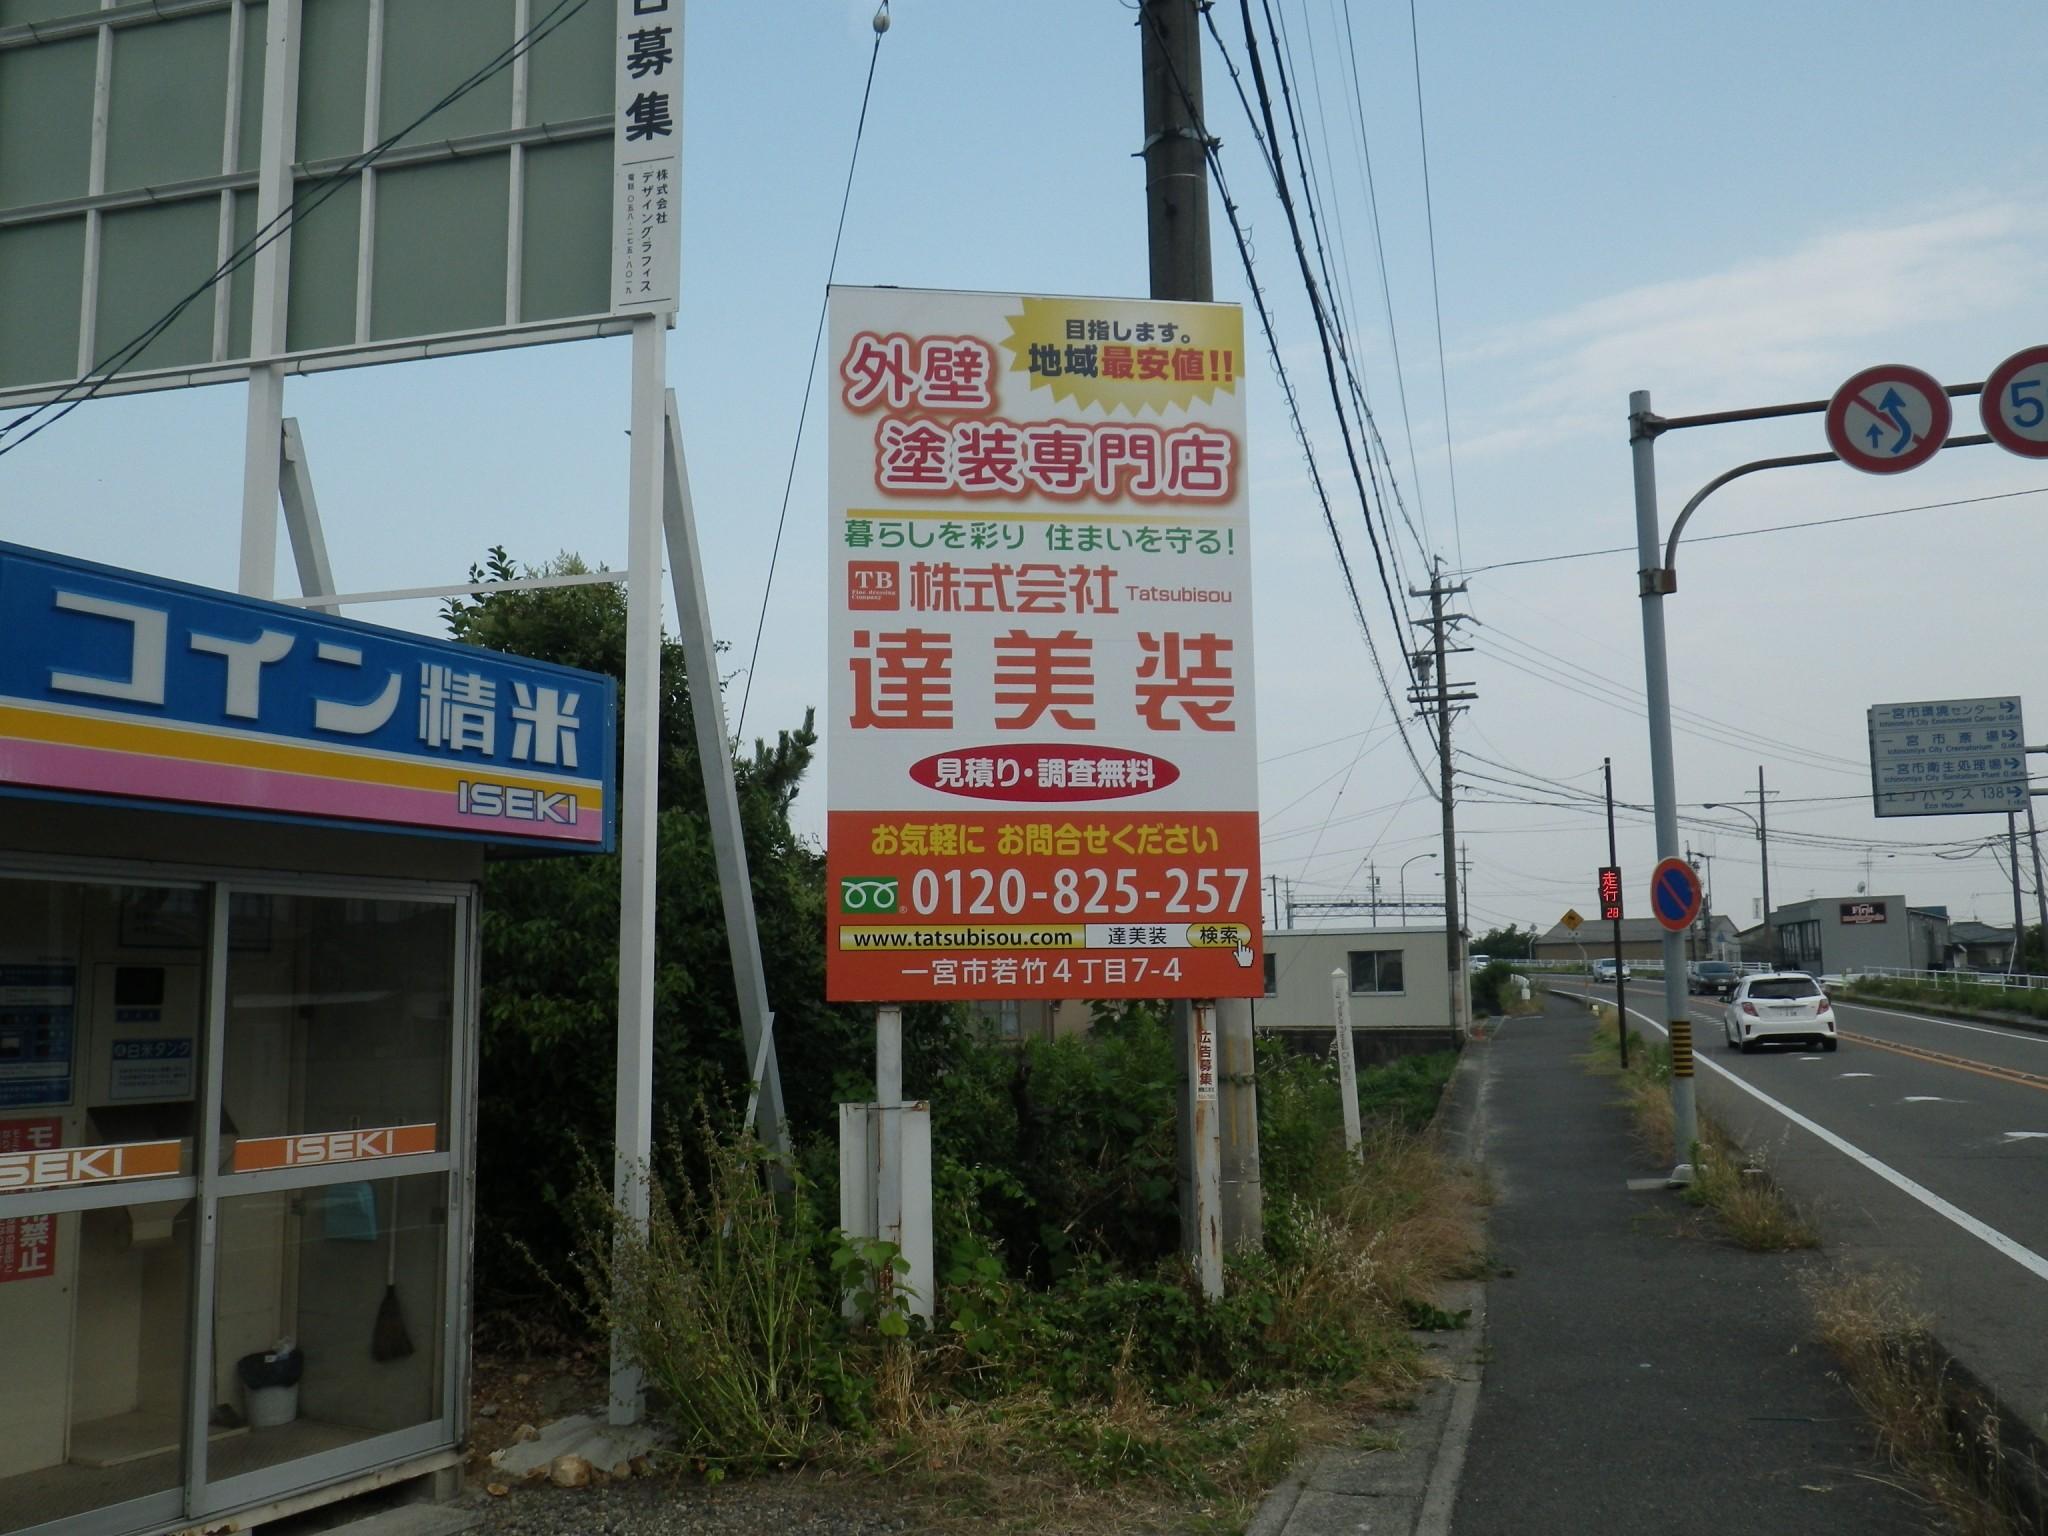 RIMG0367